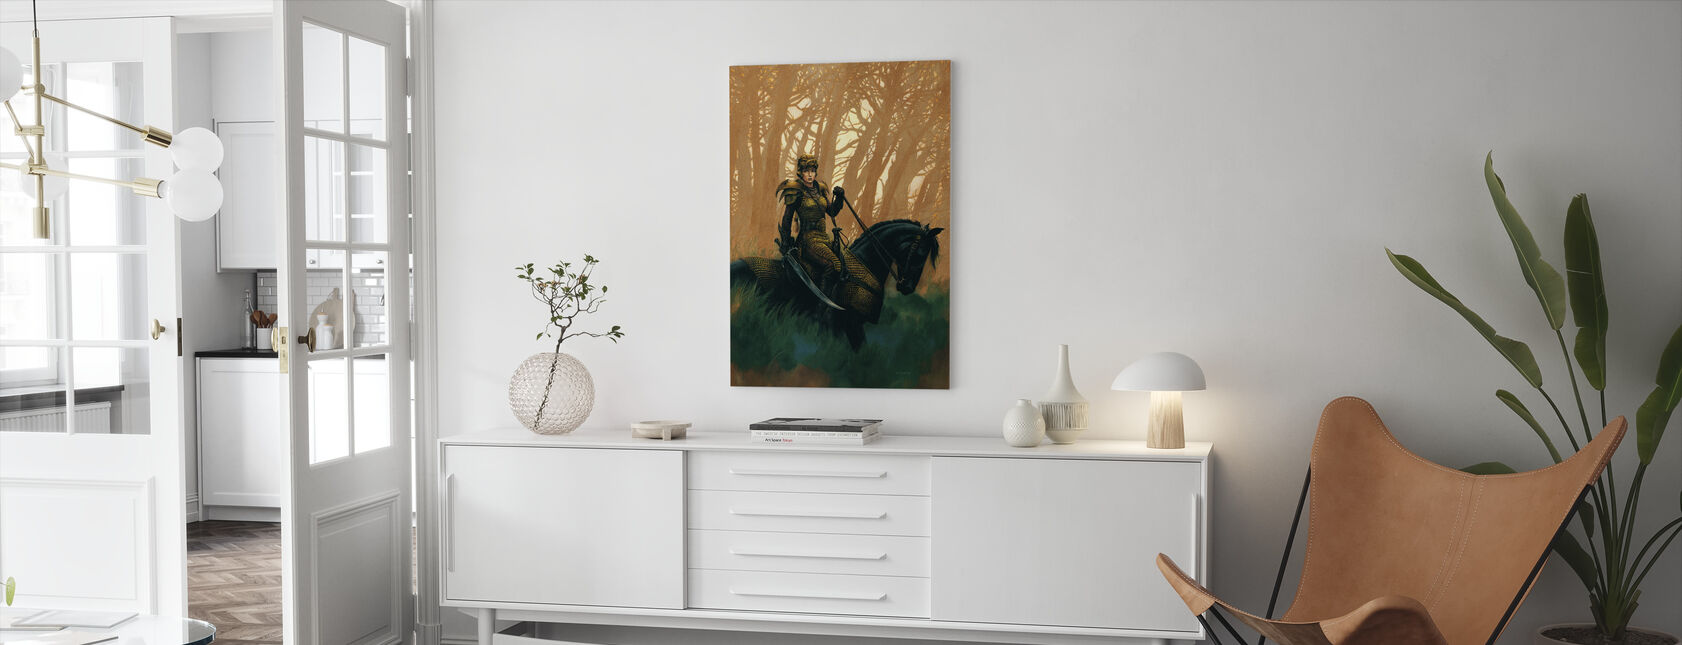 Draconis - Canvastavla - Vardagsrum